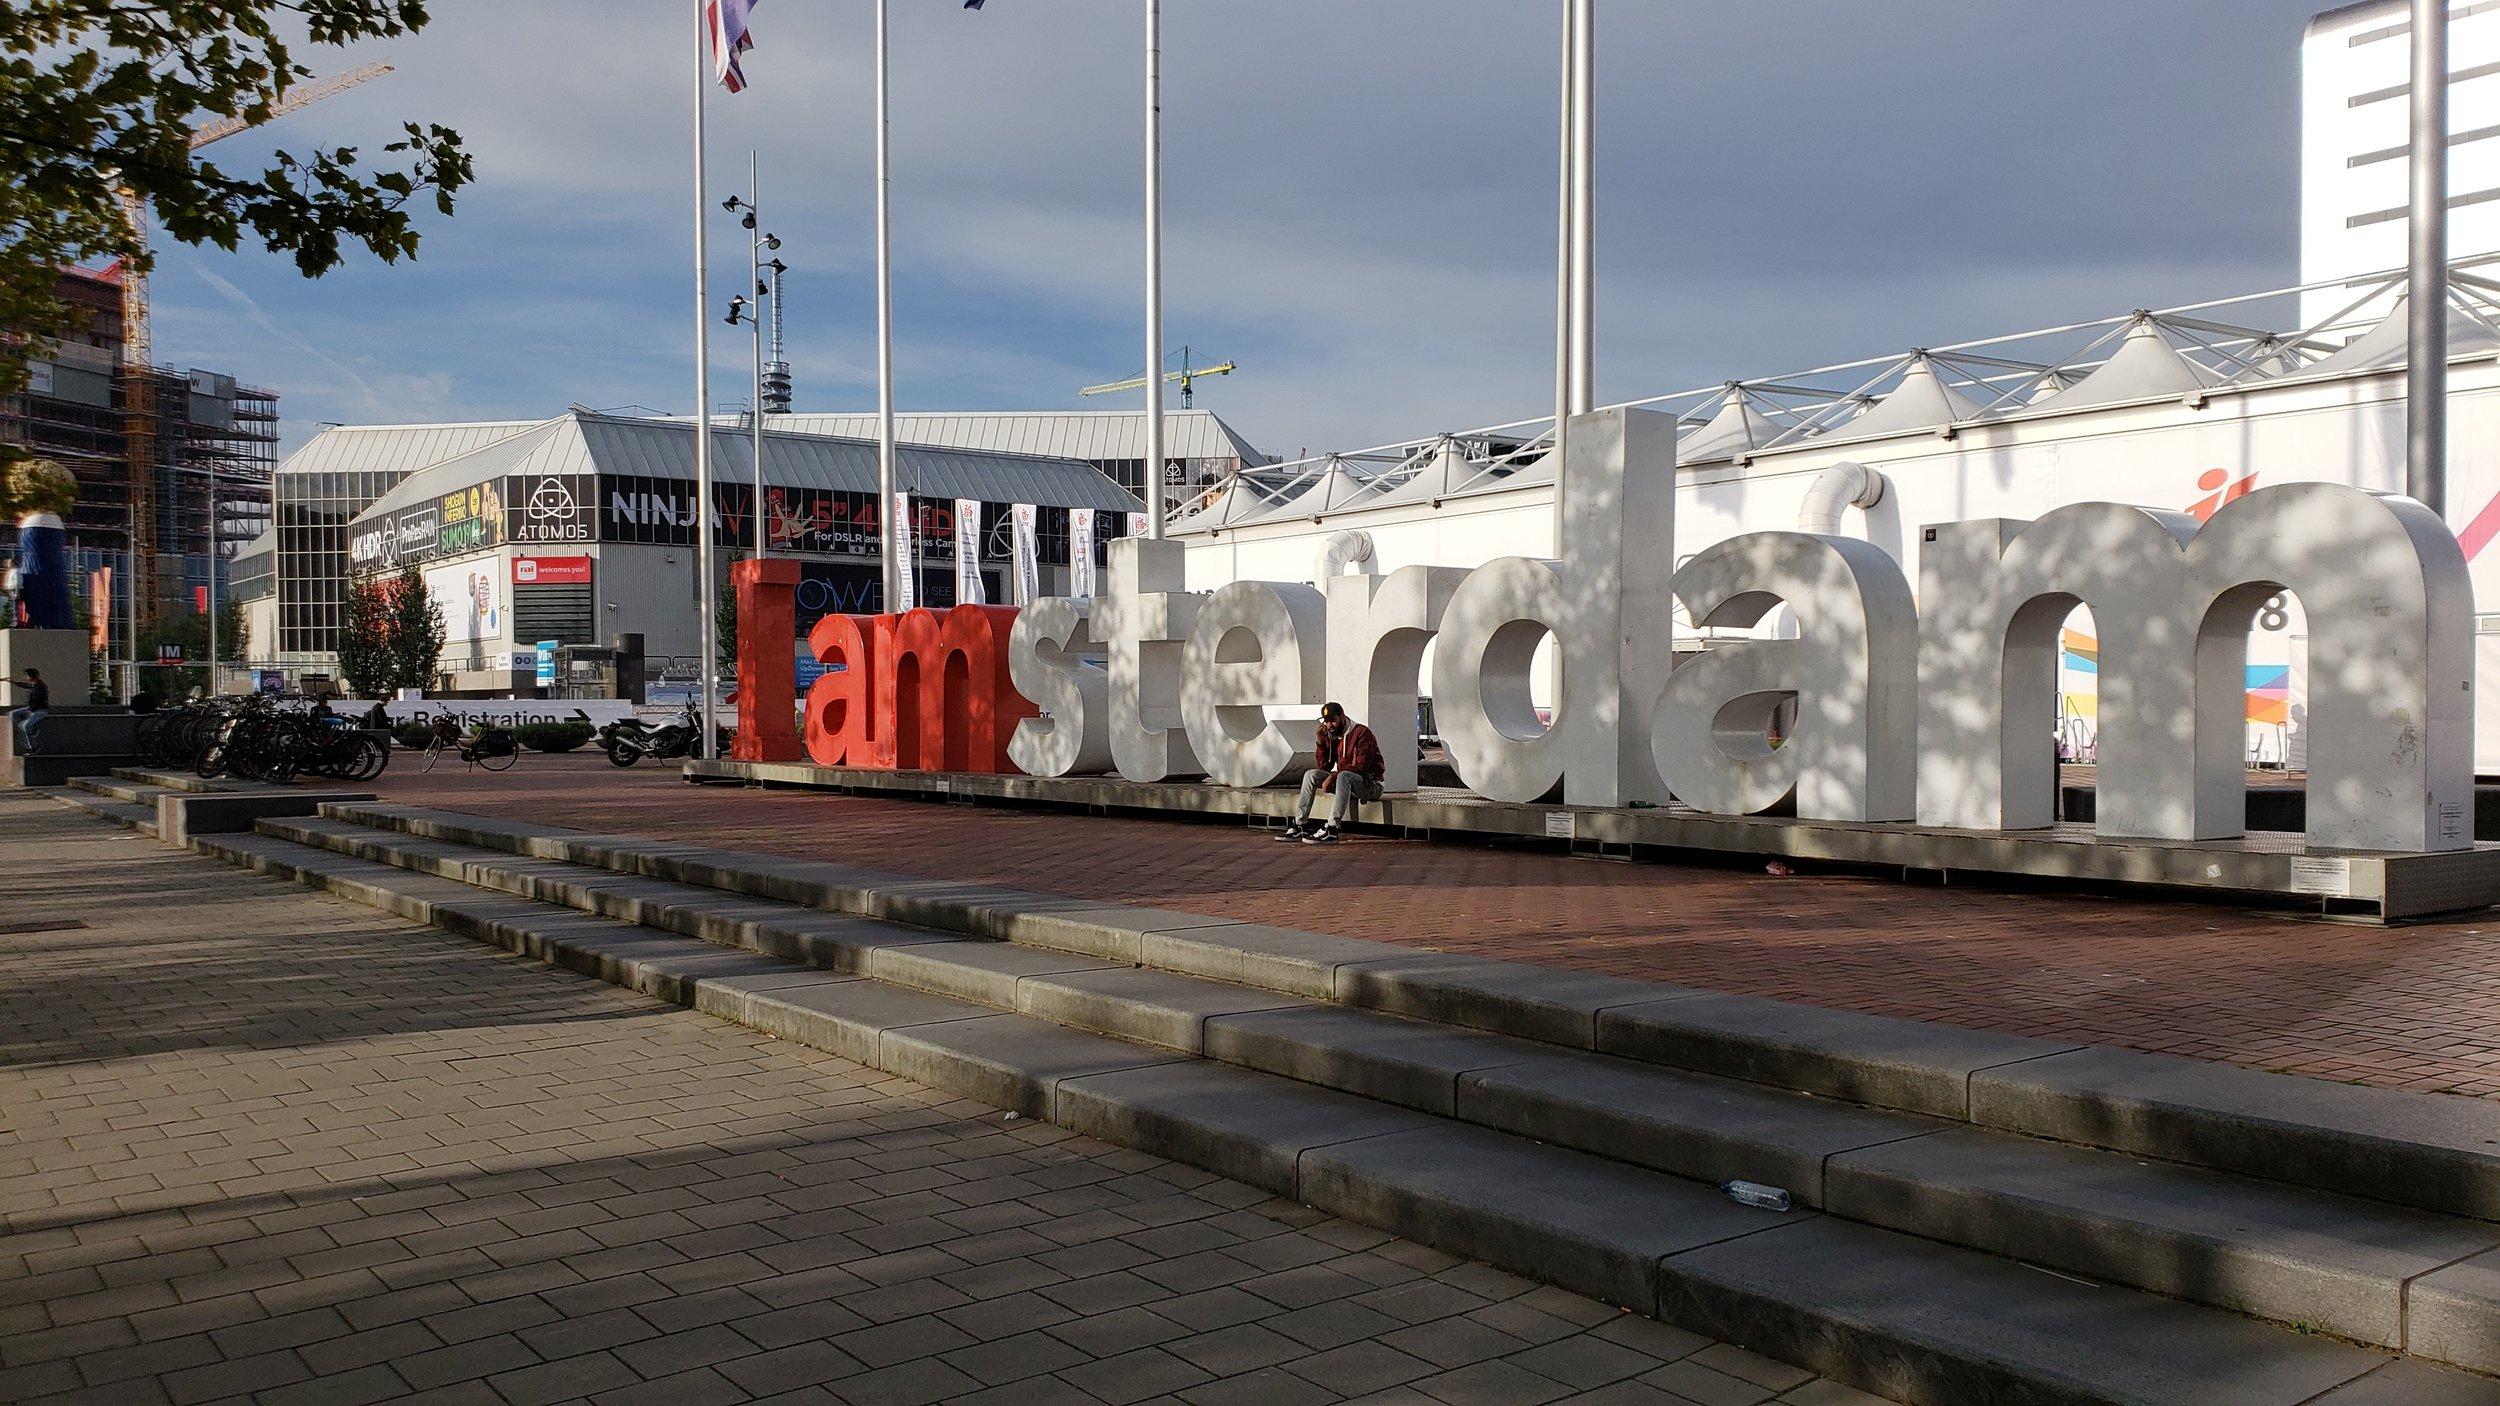 Thank you Amsterdam!